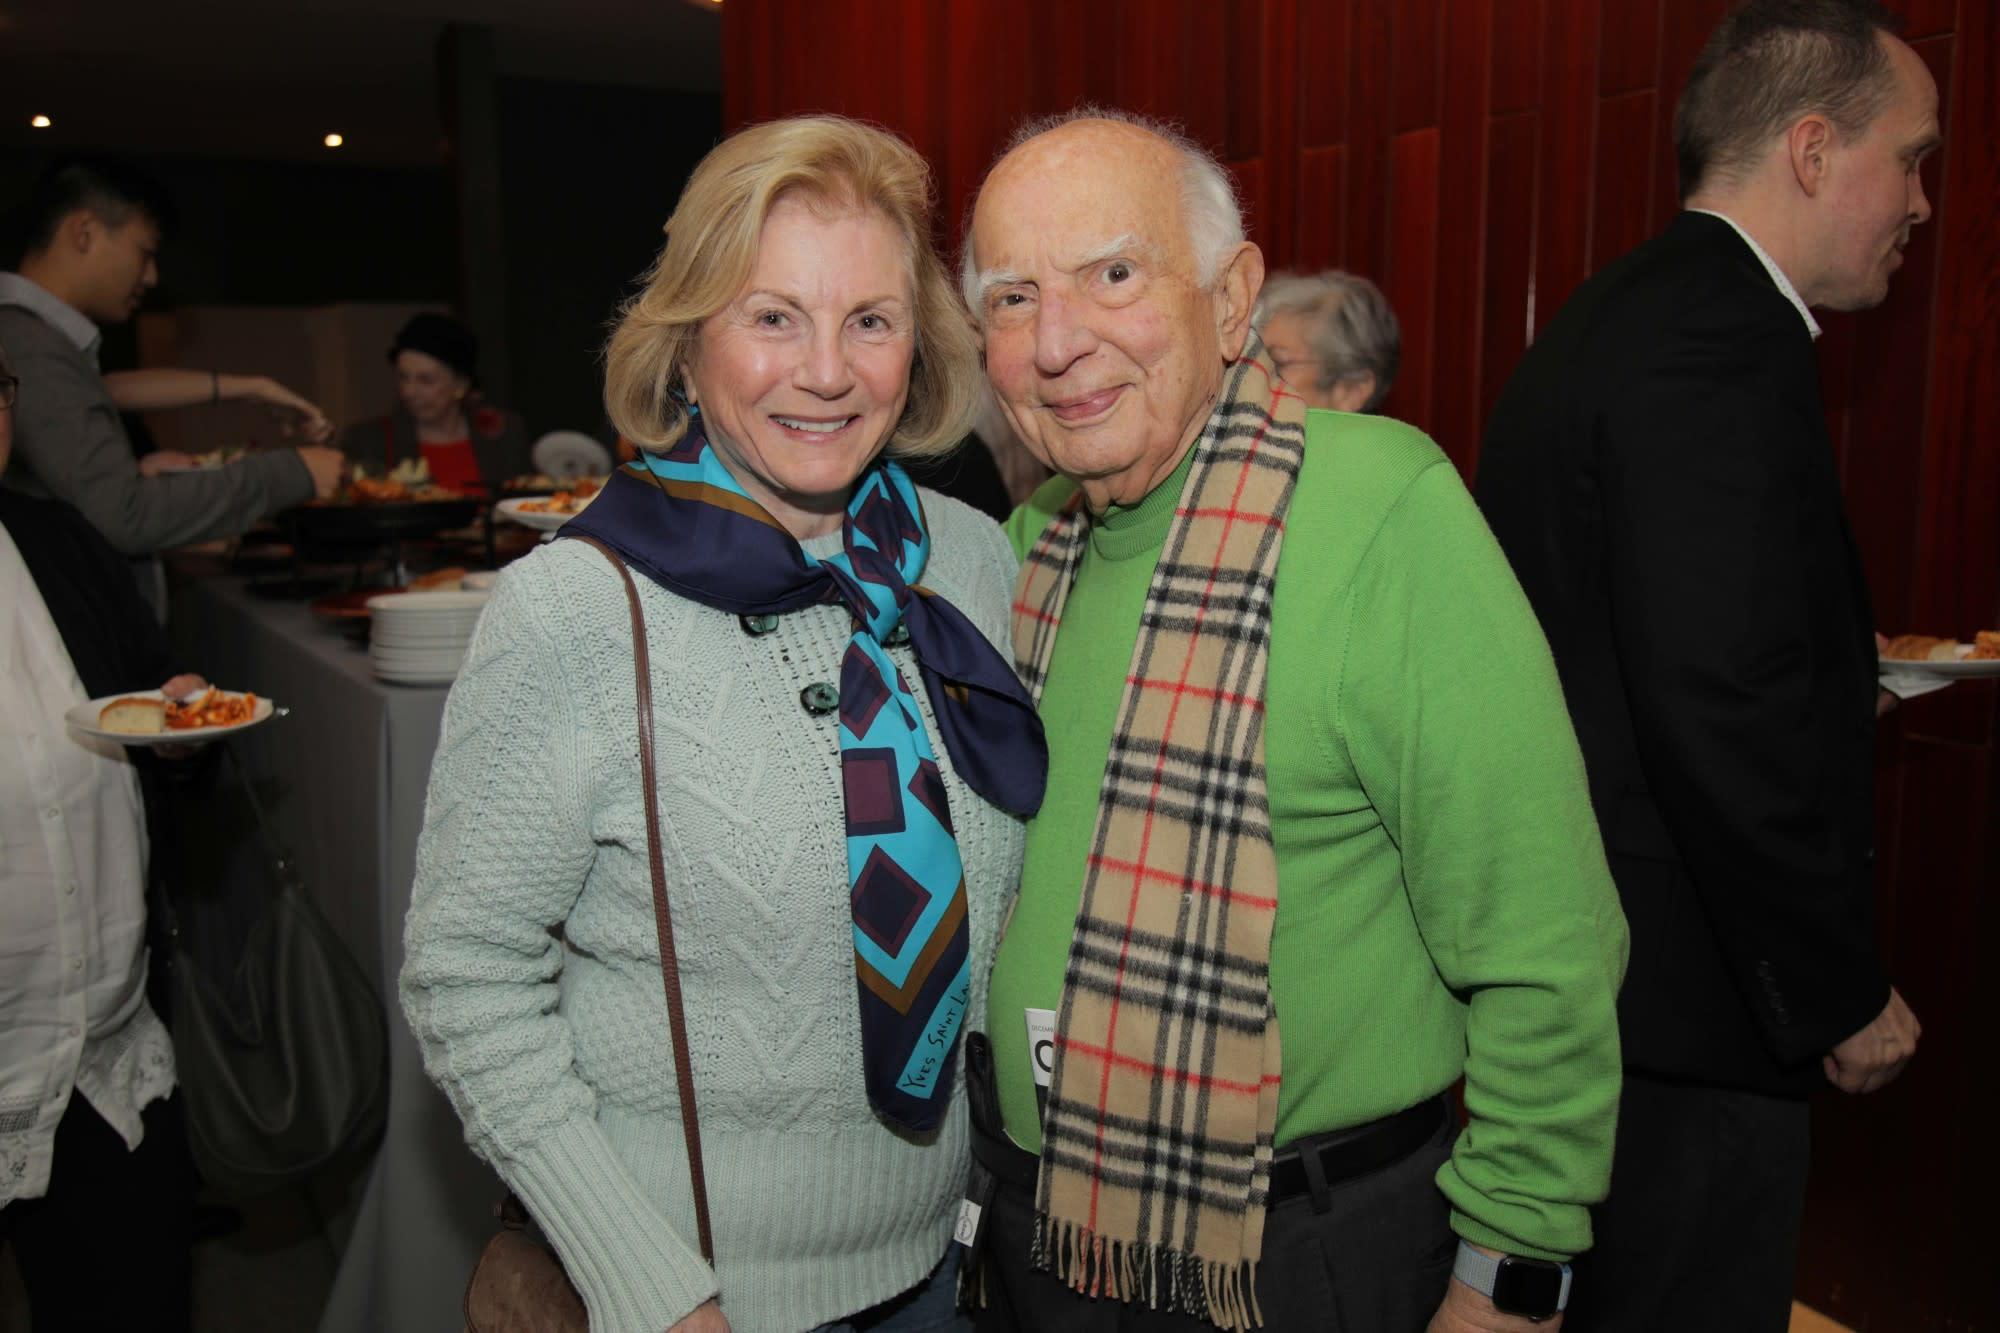 Diane and Salvatore Vacca